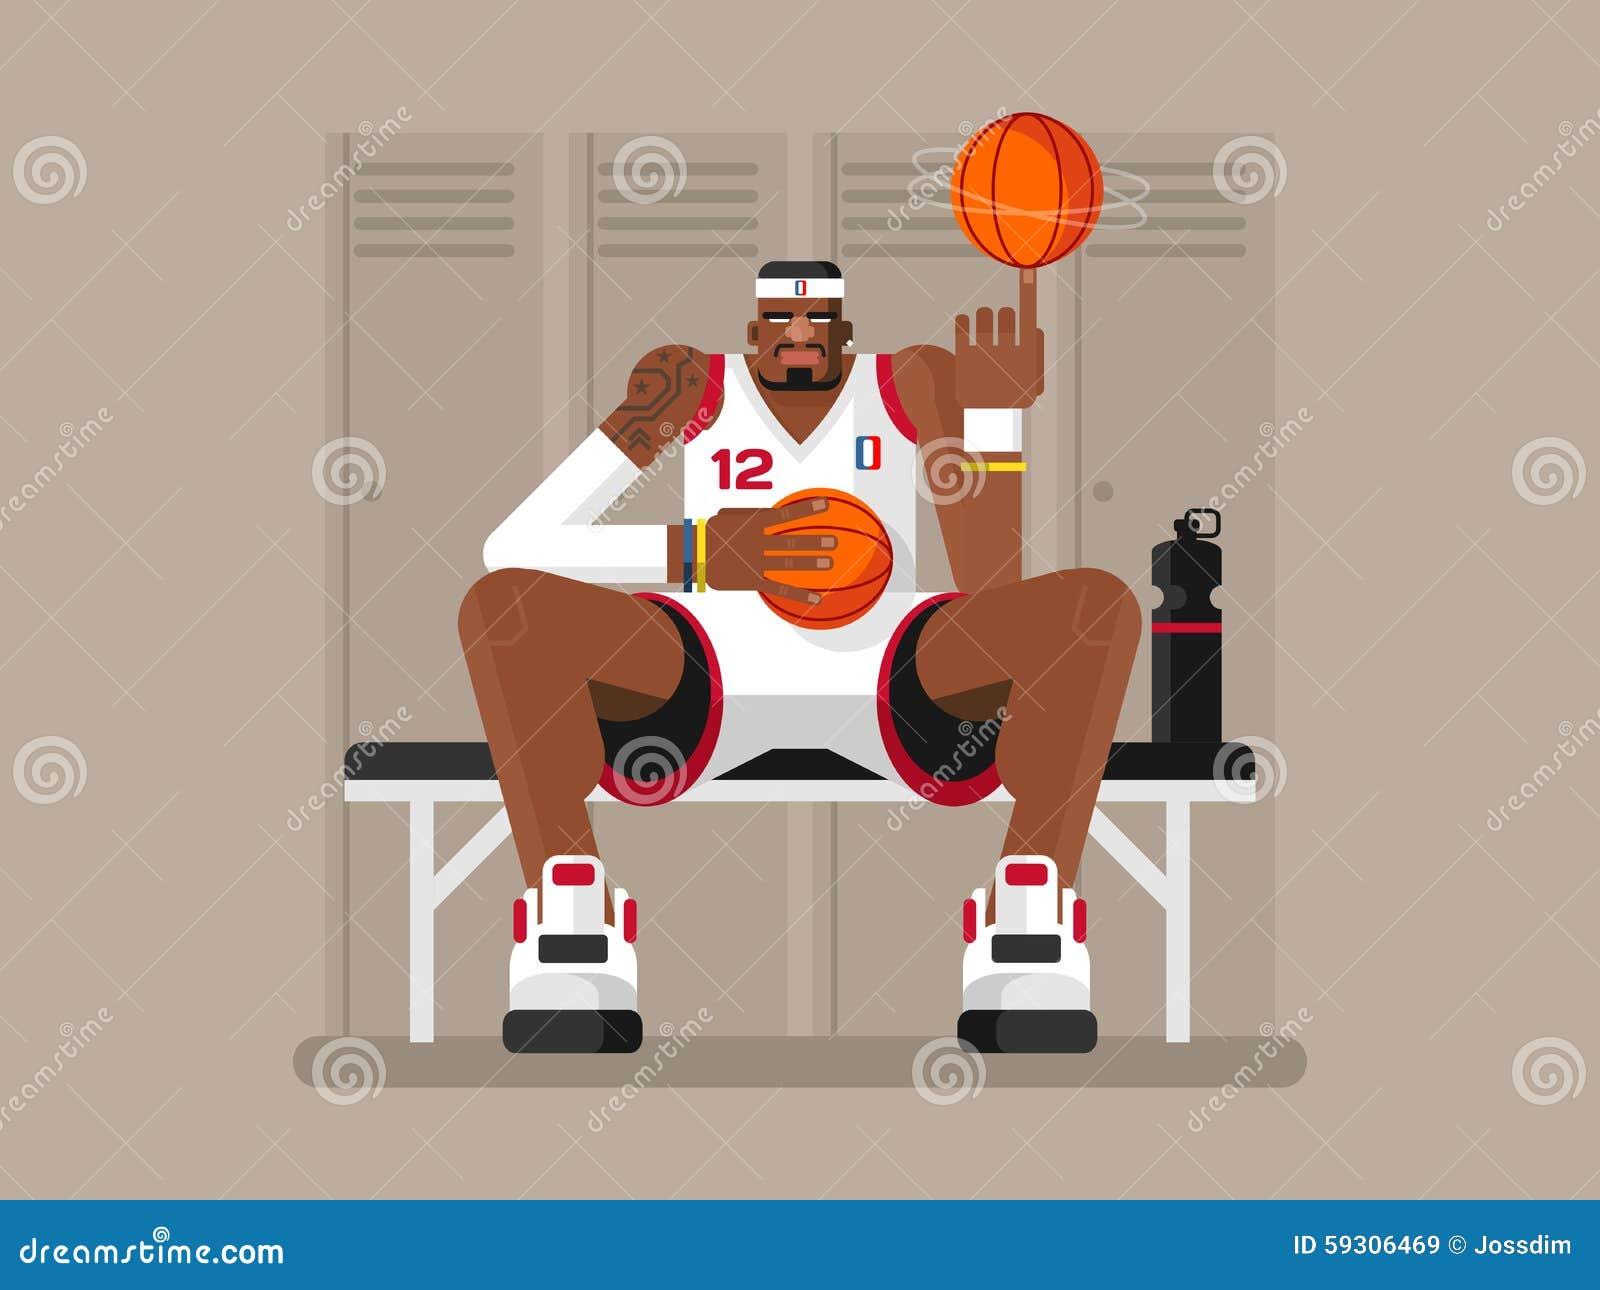 cartoon basketball games 2 players